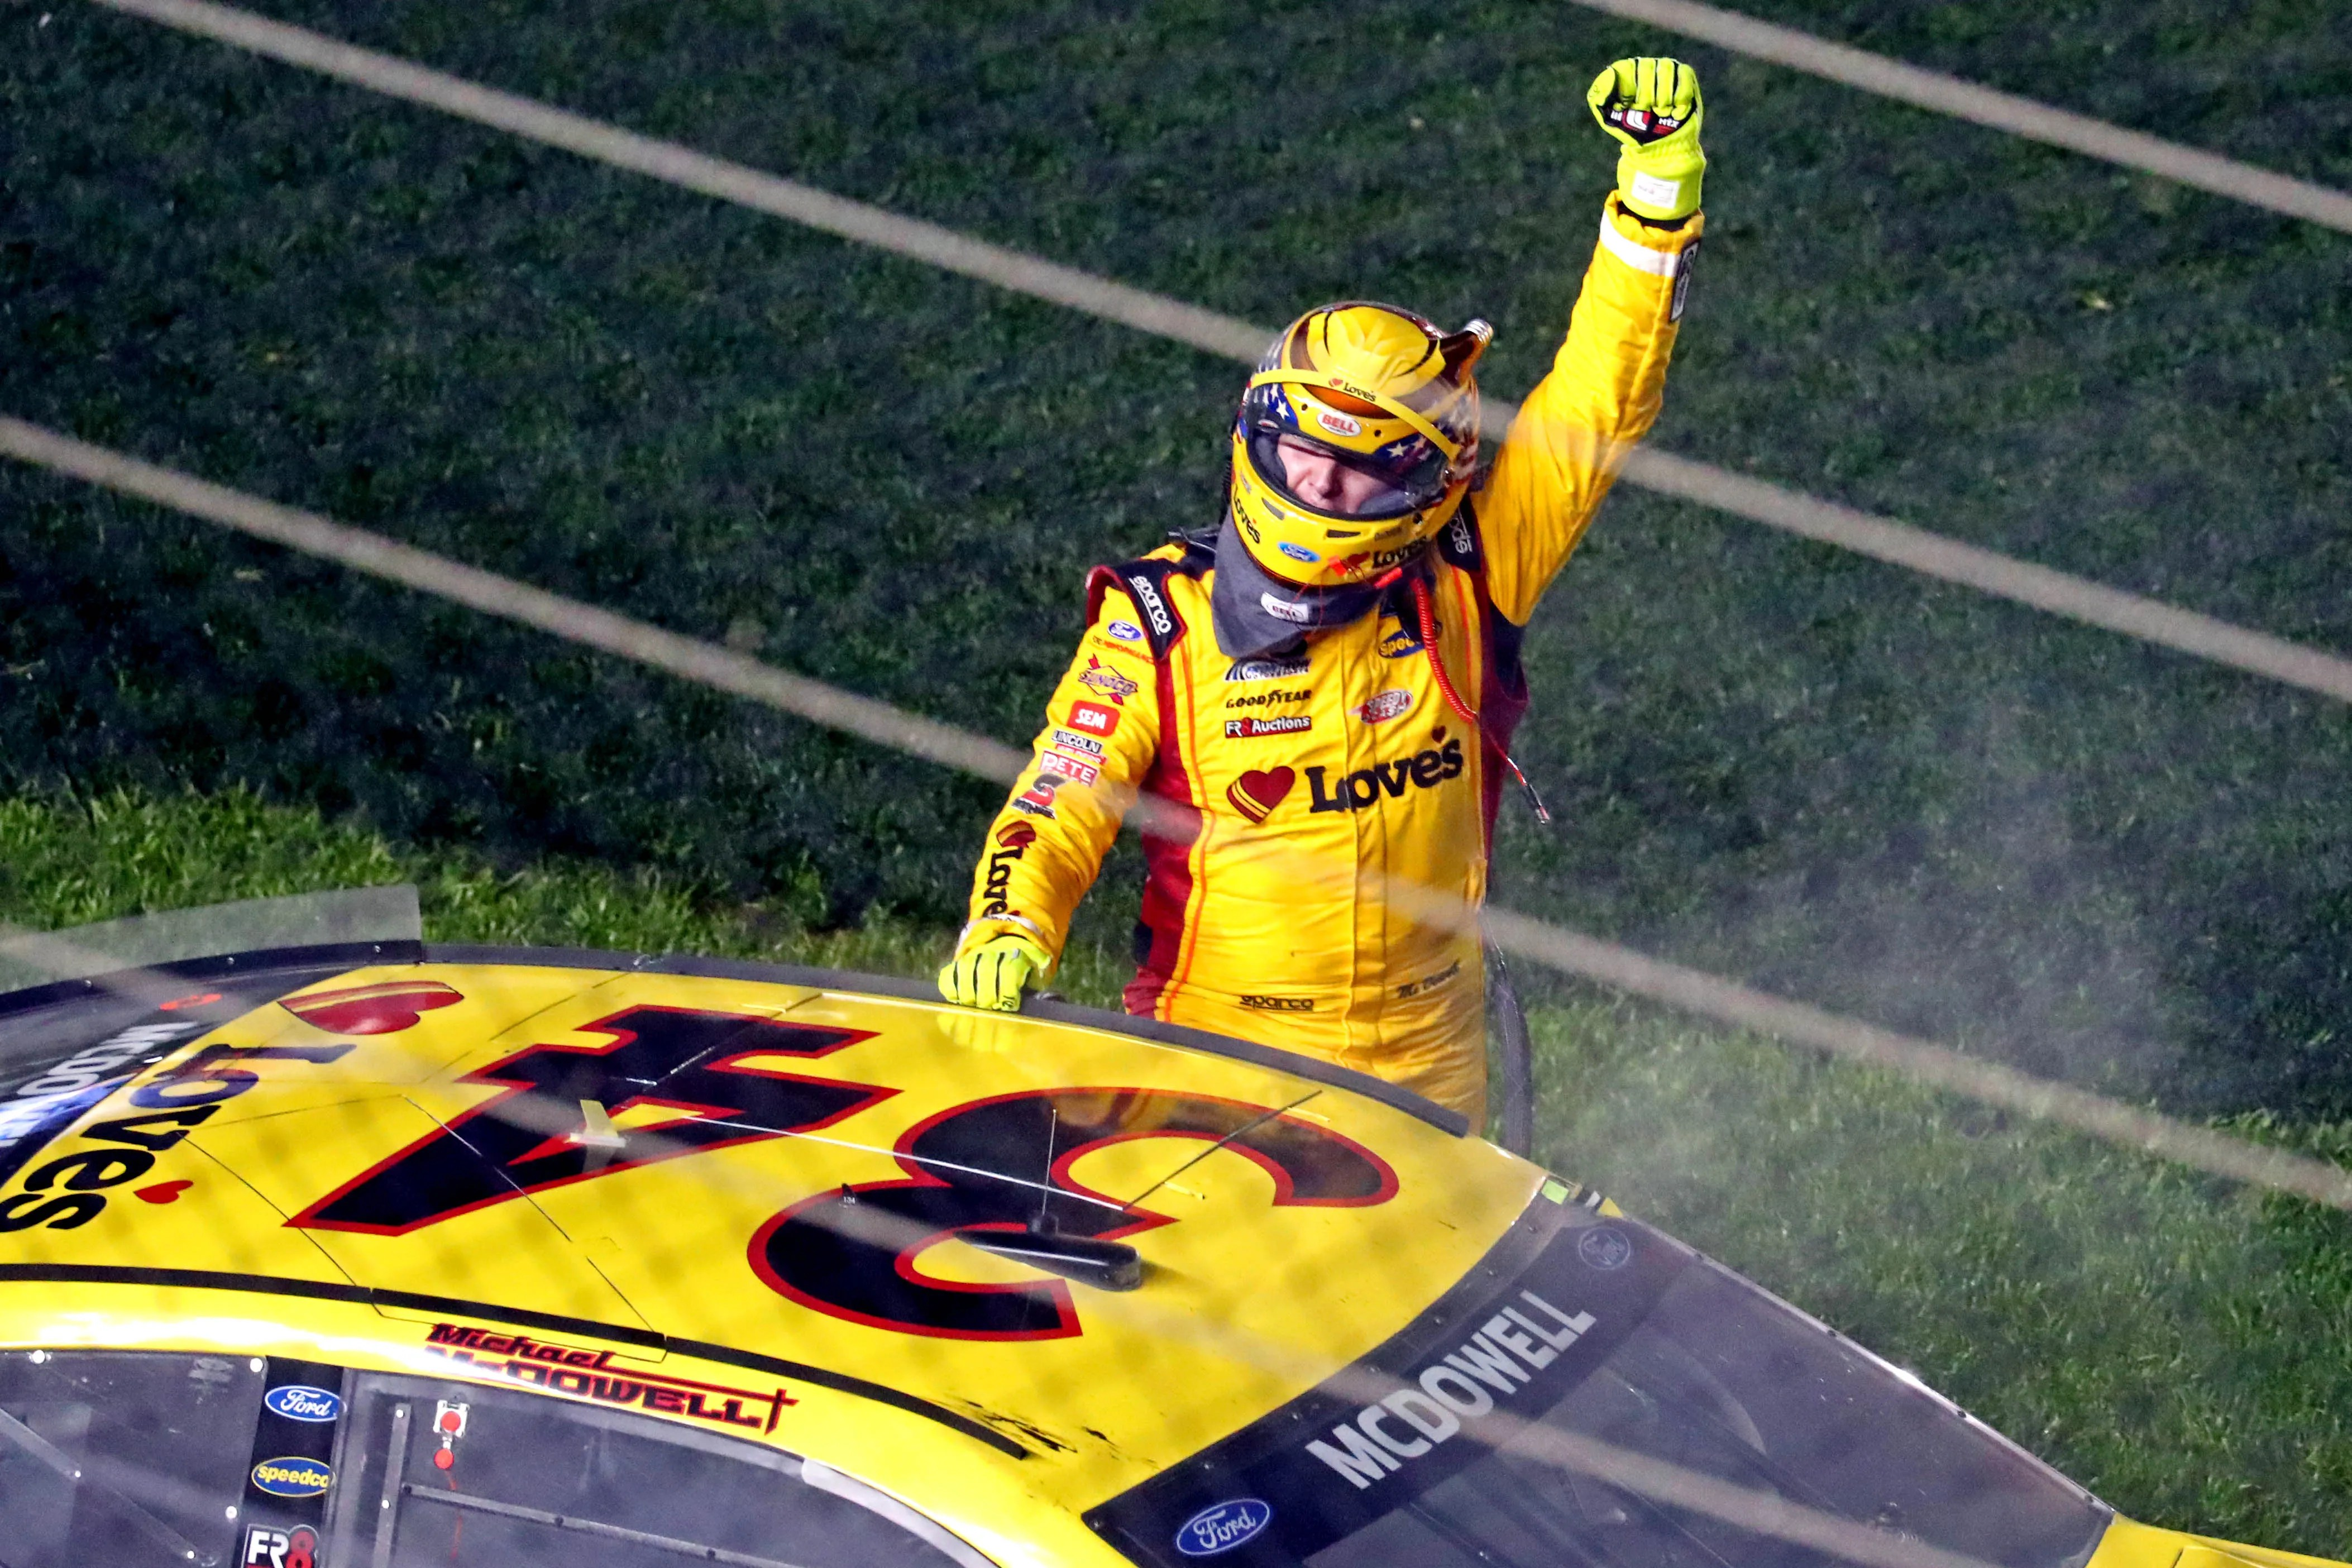 Michael McDowell celebrates after winning the 2021 Daytona 500.